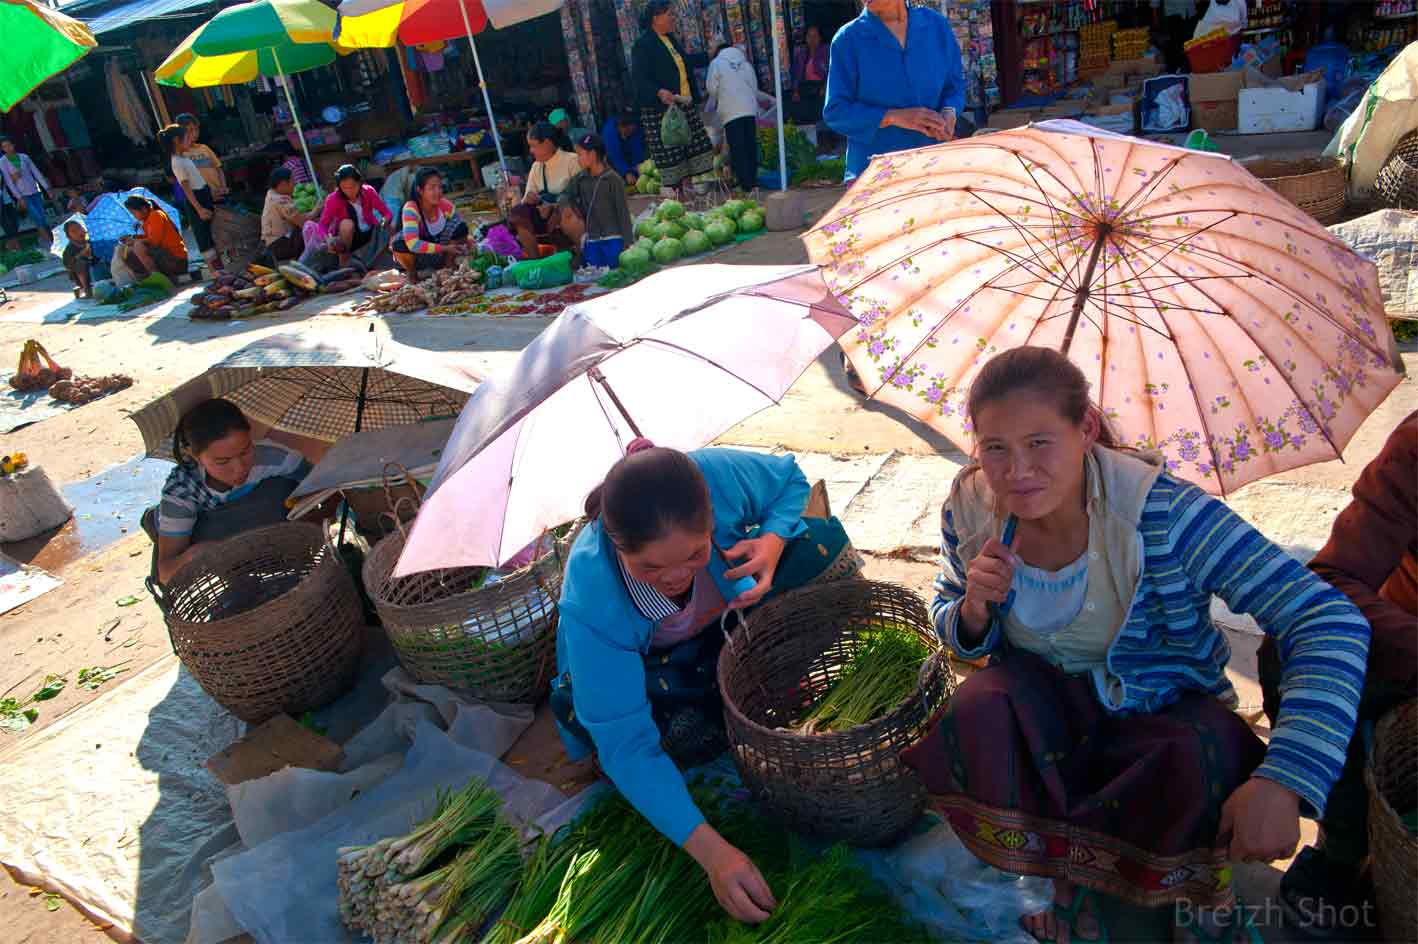 Marché de Luang Namtha, vitrine du Nord Laos